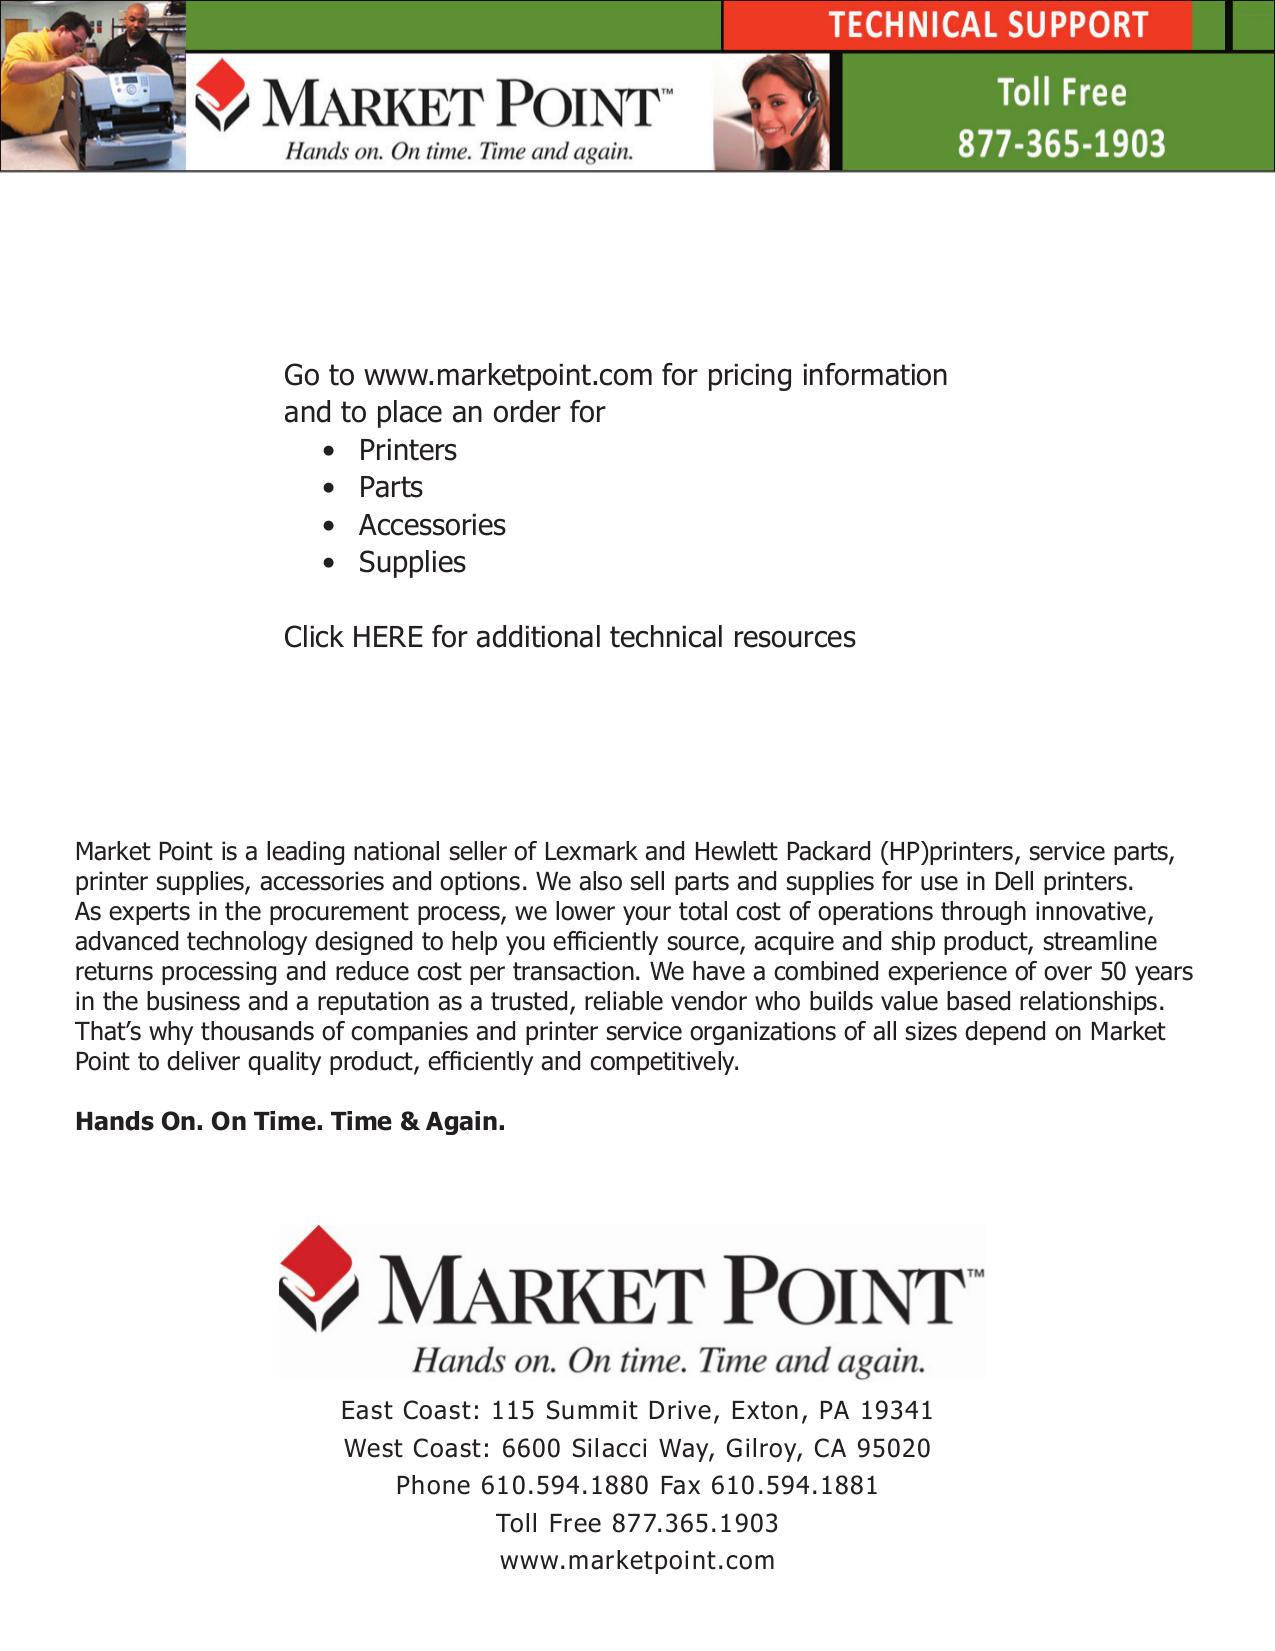 pdf for Lexmark Printer T632n manual